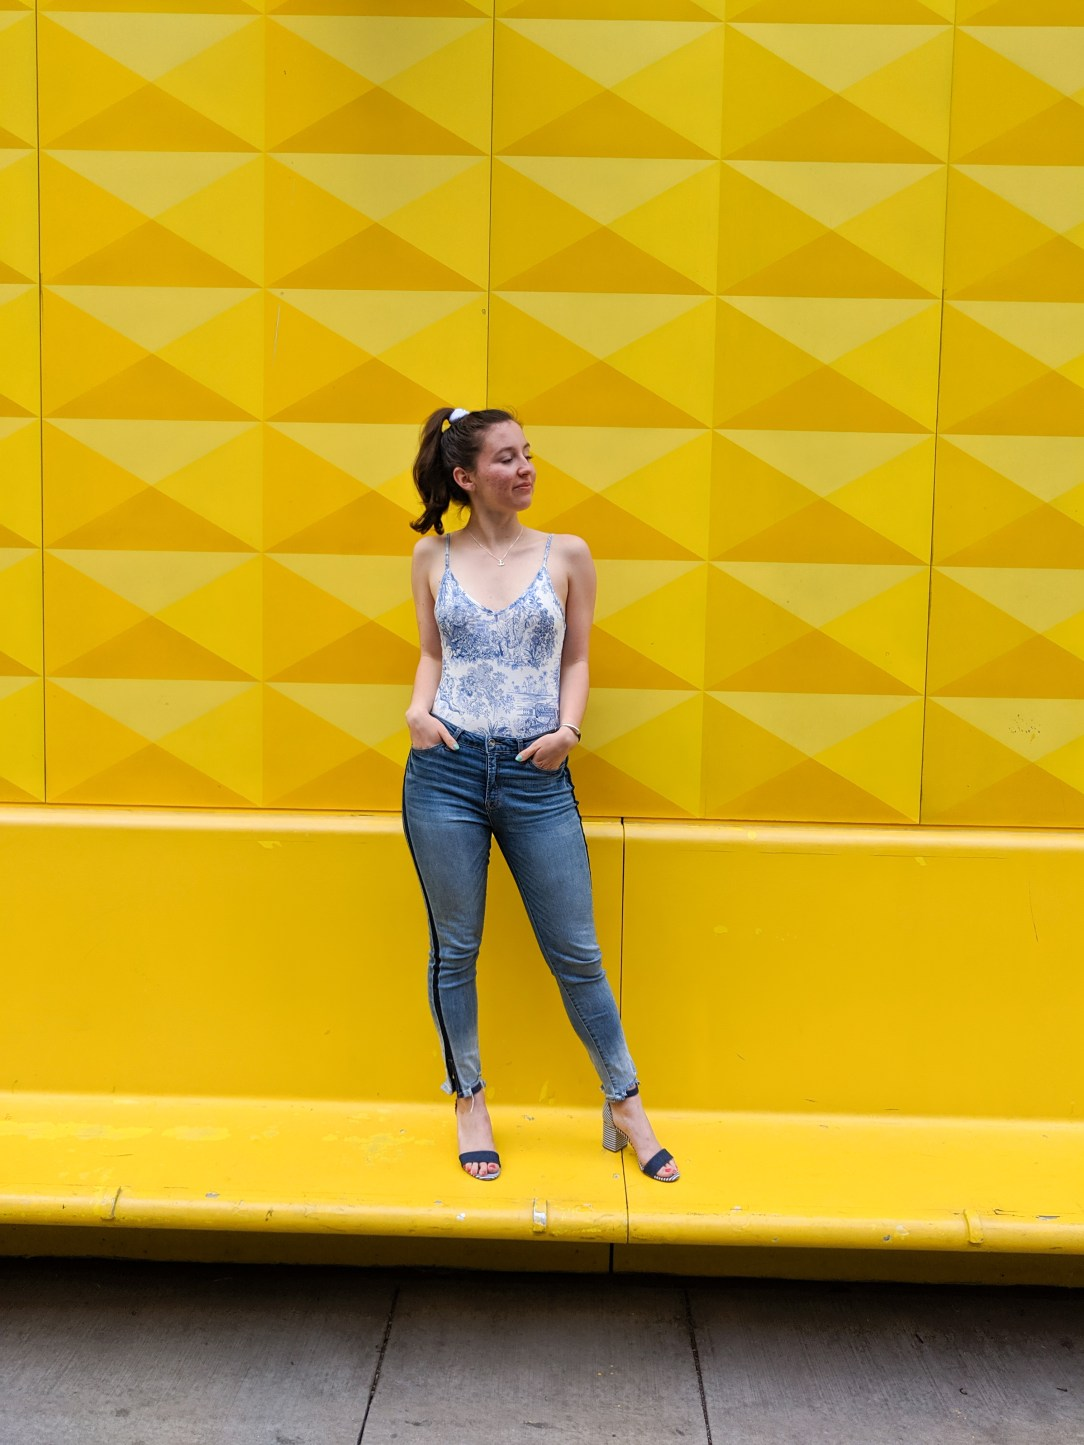 skinny jeans, bodysuit, yellow wall, downtown Denver